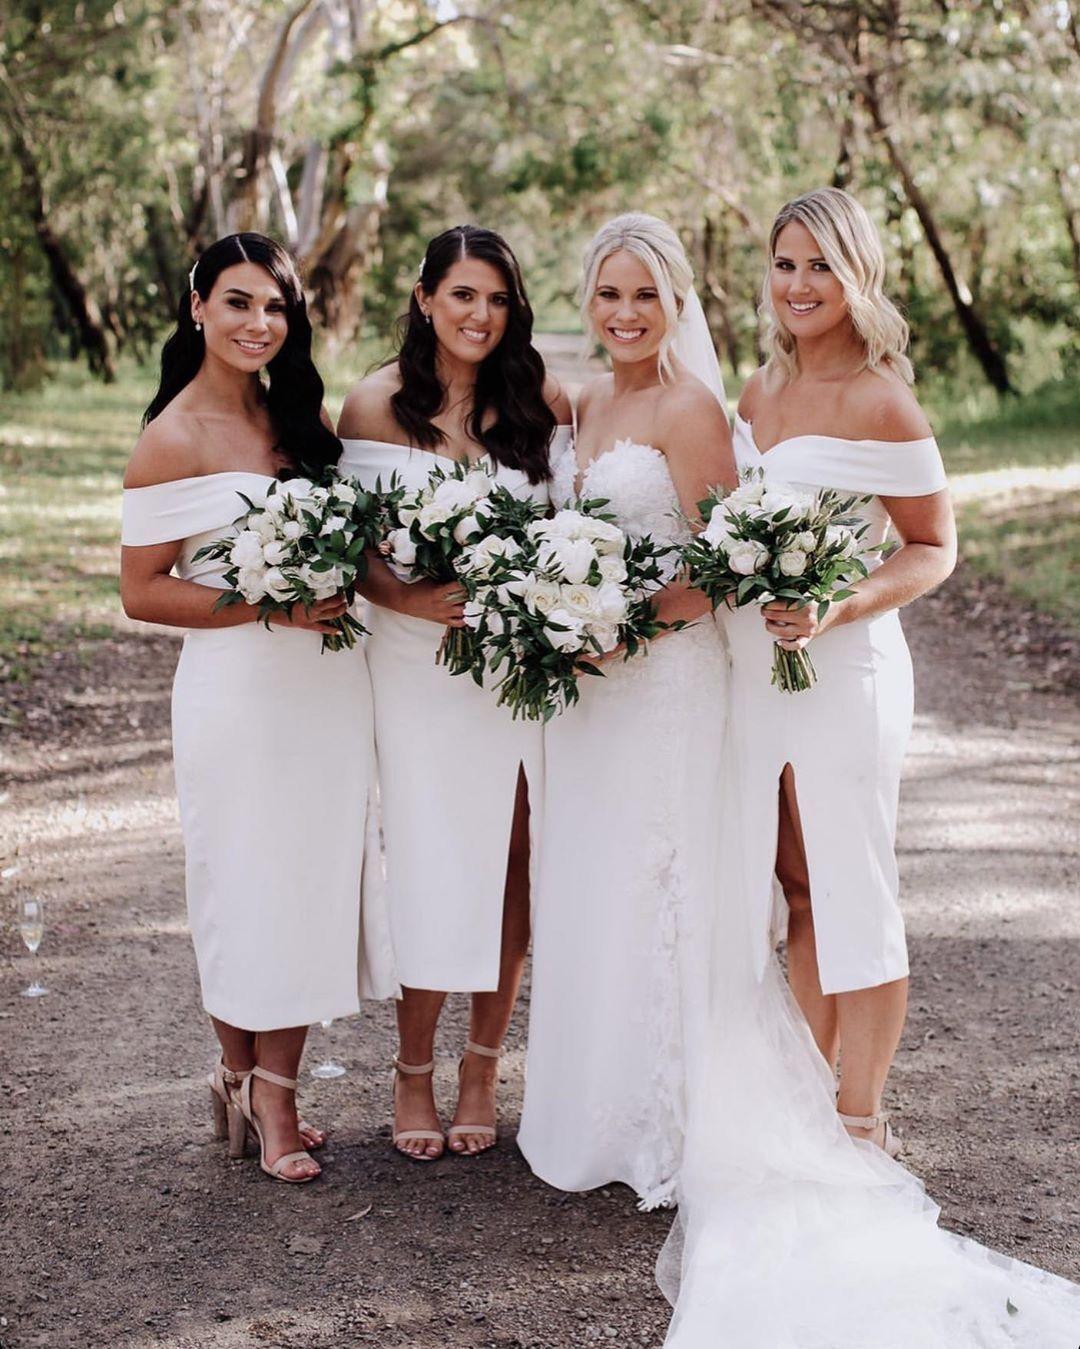 Beautiful Sheath Off The Shoulder White Tea Length Bridesmaid Dress Cheap Long Bridesmaid Dresses Tea Length Bridesmaid Dresses White Bridesmaid Dresses [ 1349 x 1080 Pixel ]